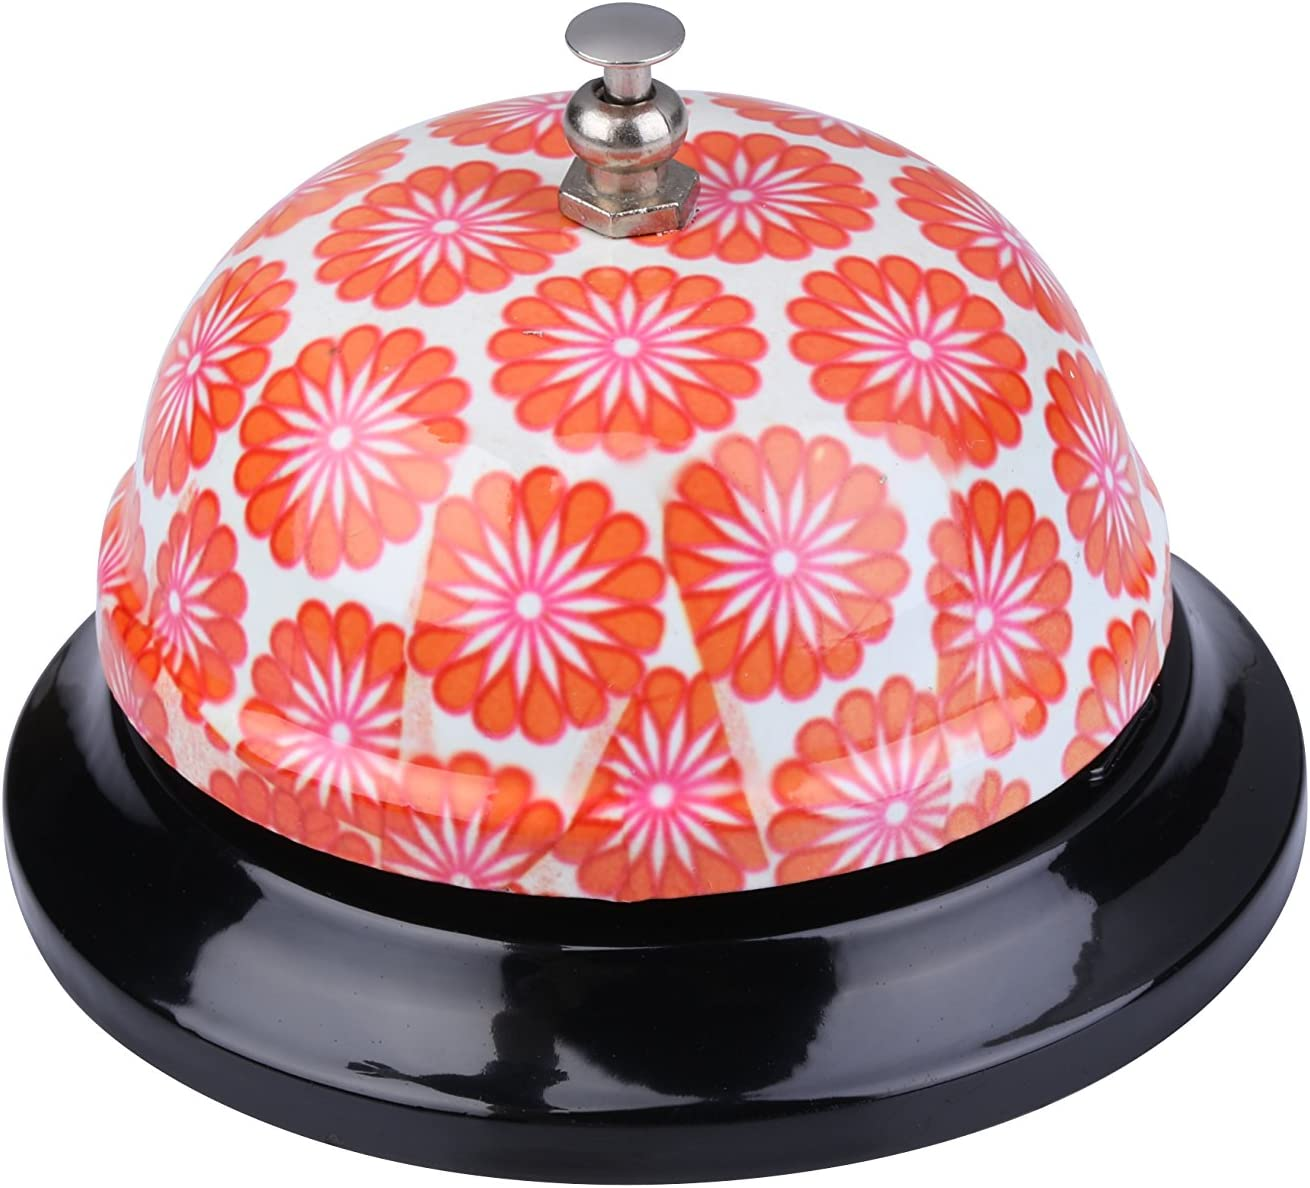 I-MART Call Bell, Service Bell, Front Desk Bell, Ring Bell for Office, Hotel, Classroom, School, Dinner, Kitchen, Restaurants (Orange Color Flower)